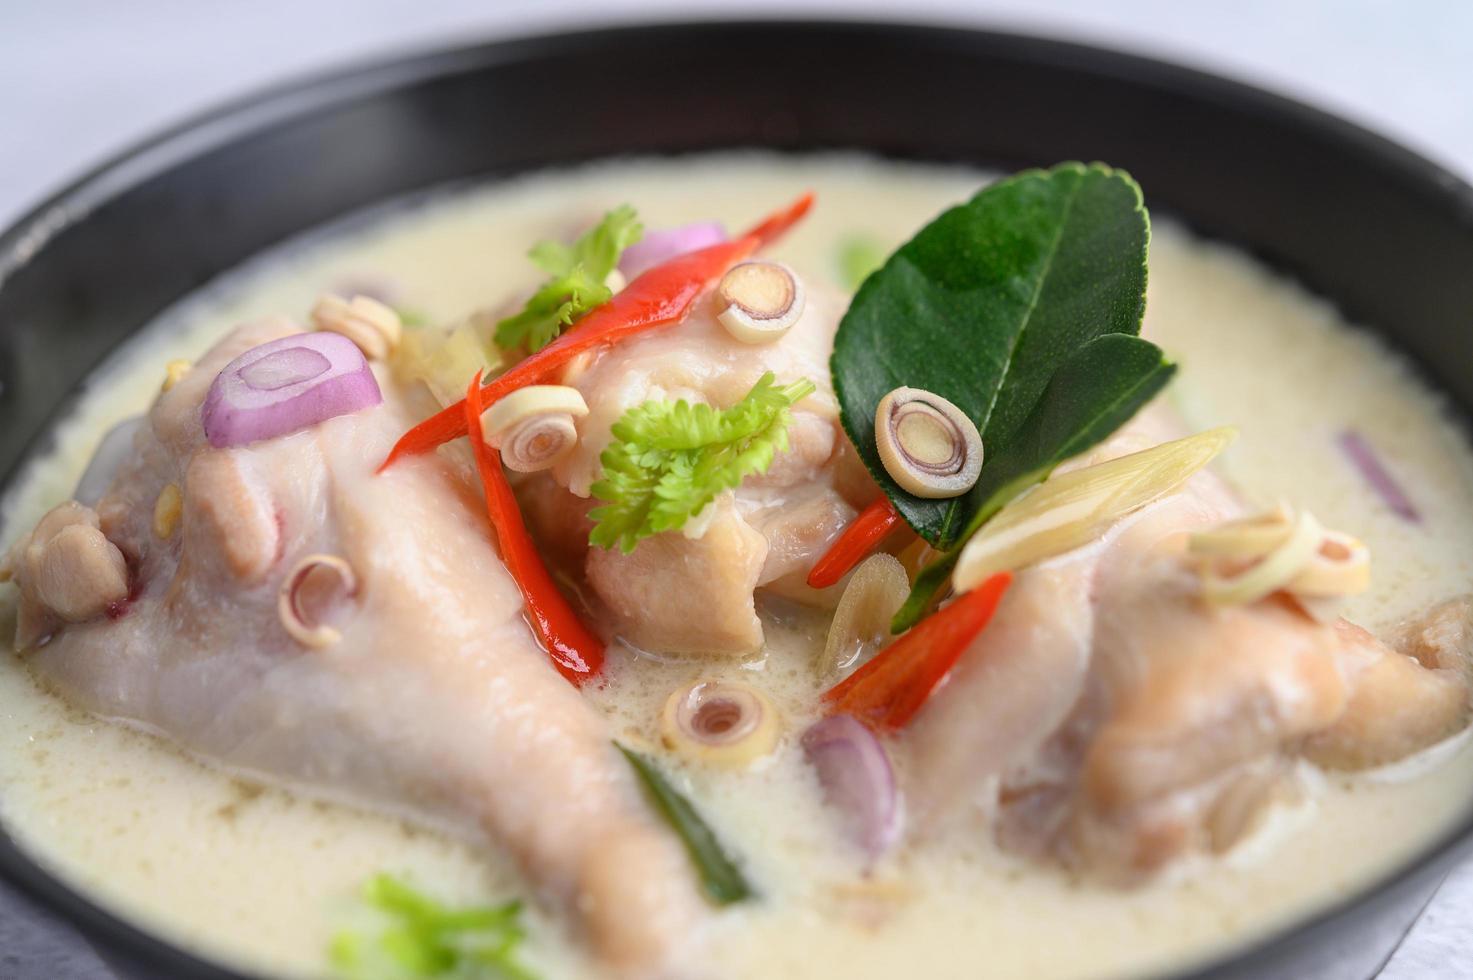 tom kha kai soep met kaffir limoenblaadjes, citroengras, rode ui, laos en chili foto